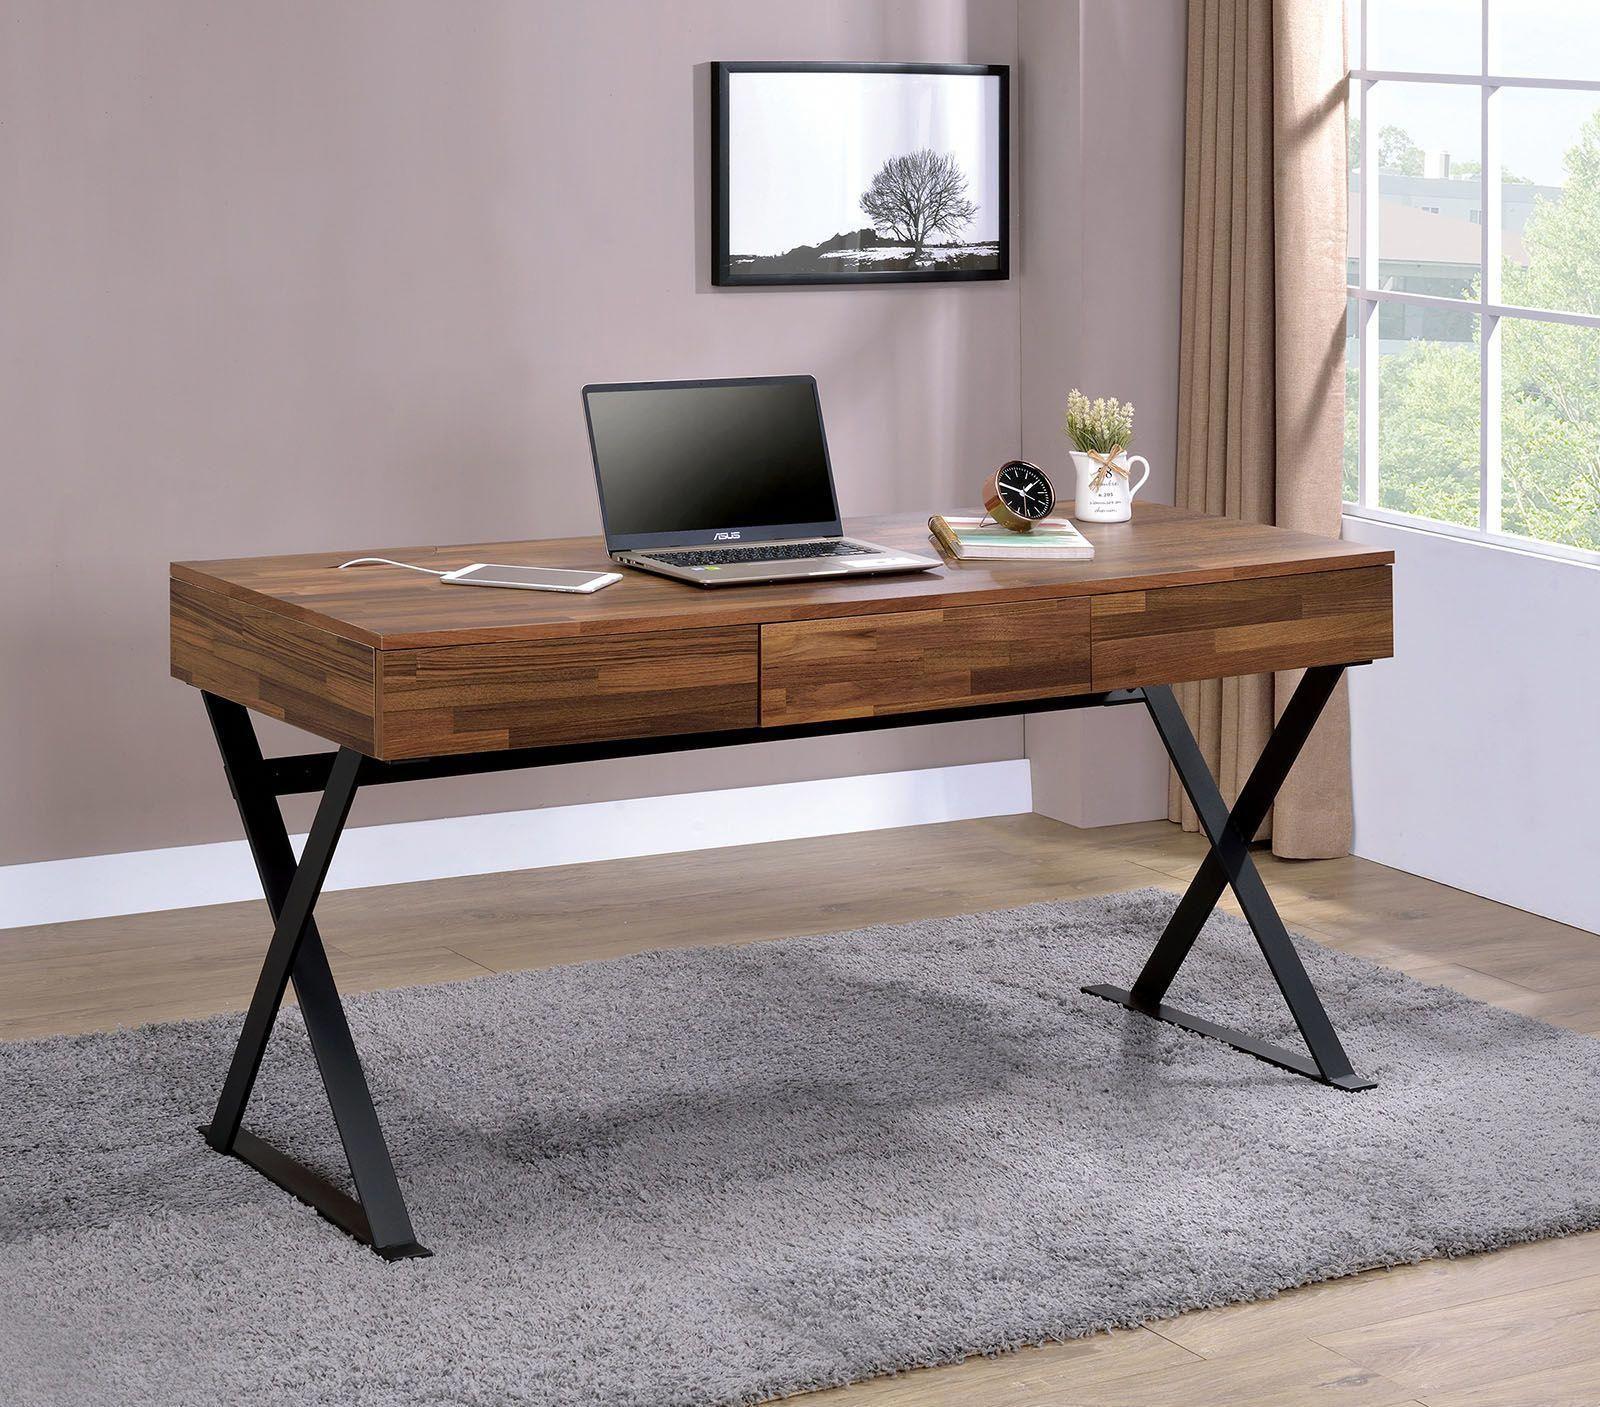 Tensed Computer Desk Cm Dk807 Furniture Of America Office Desks In 2020 Cheap Office Furniture Industrial Style Office Desk Wood And Metal Desk